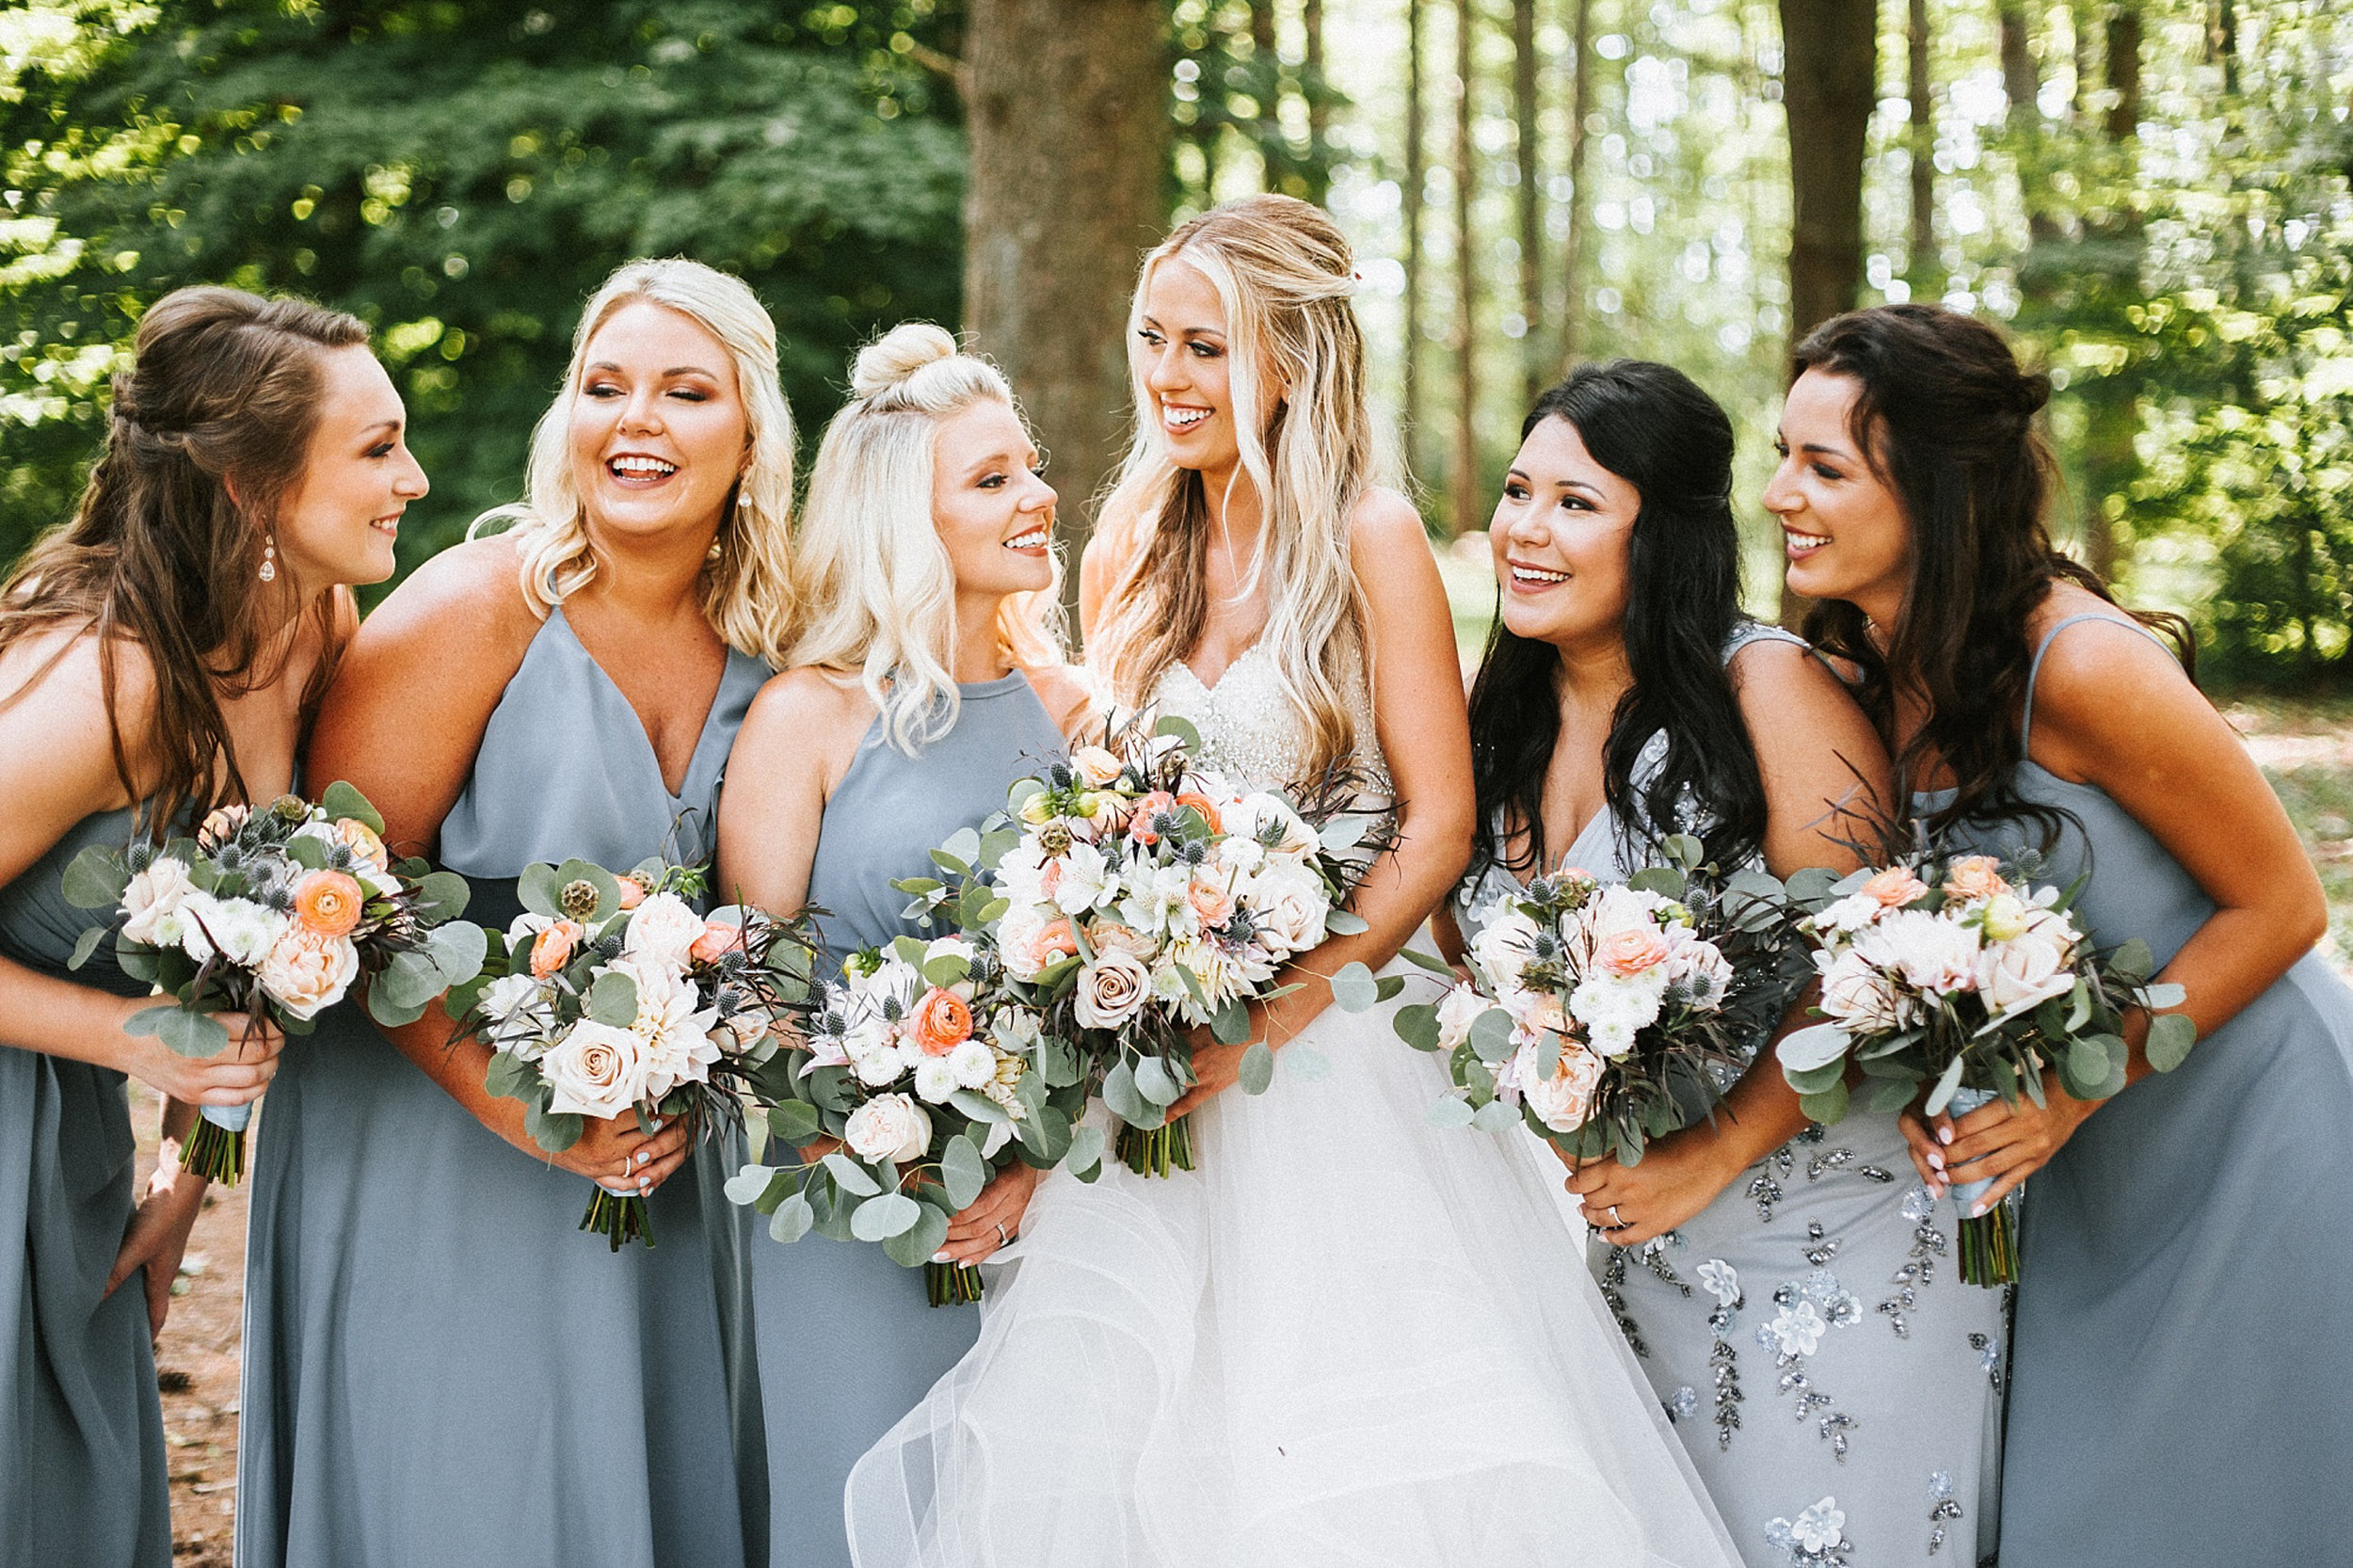 Brooke Townsend Photography - Cincinnati Wedding Photographer (17 of 153).jpg